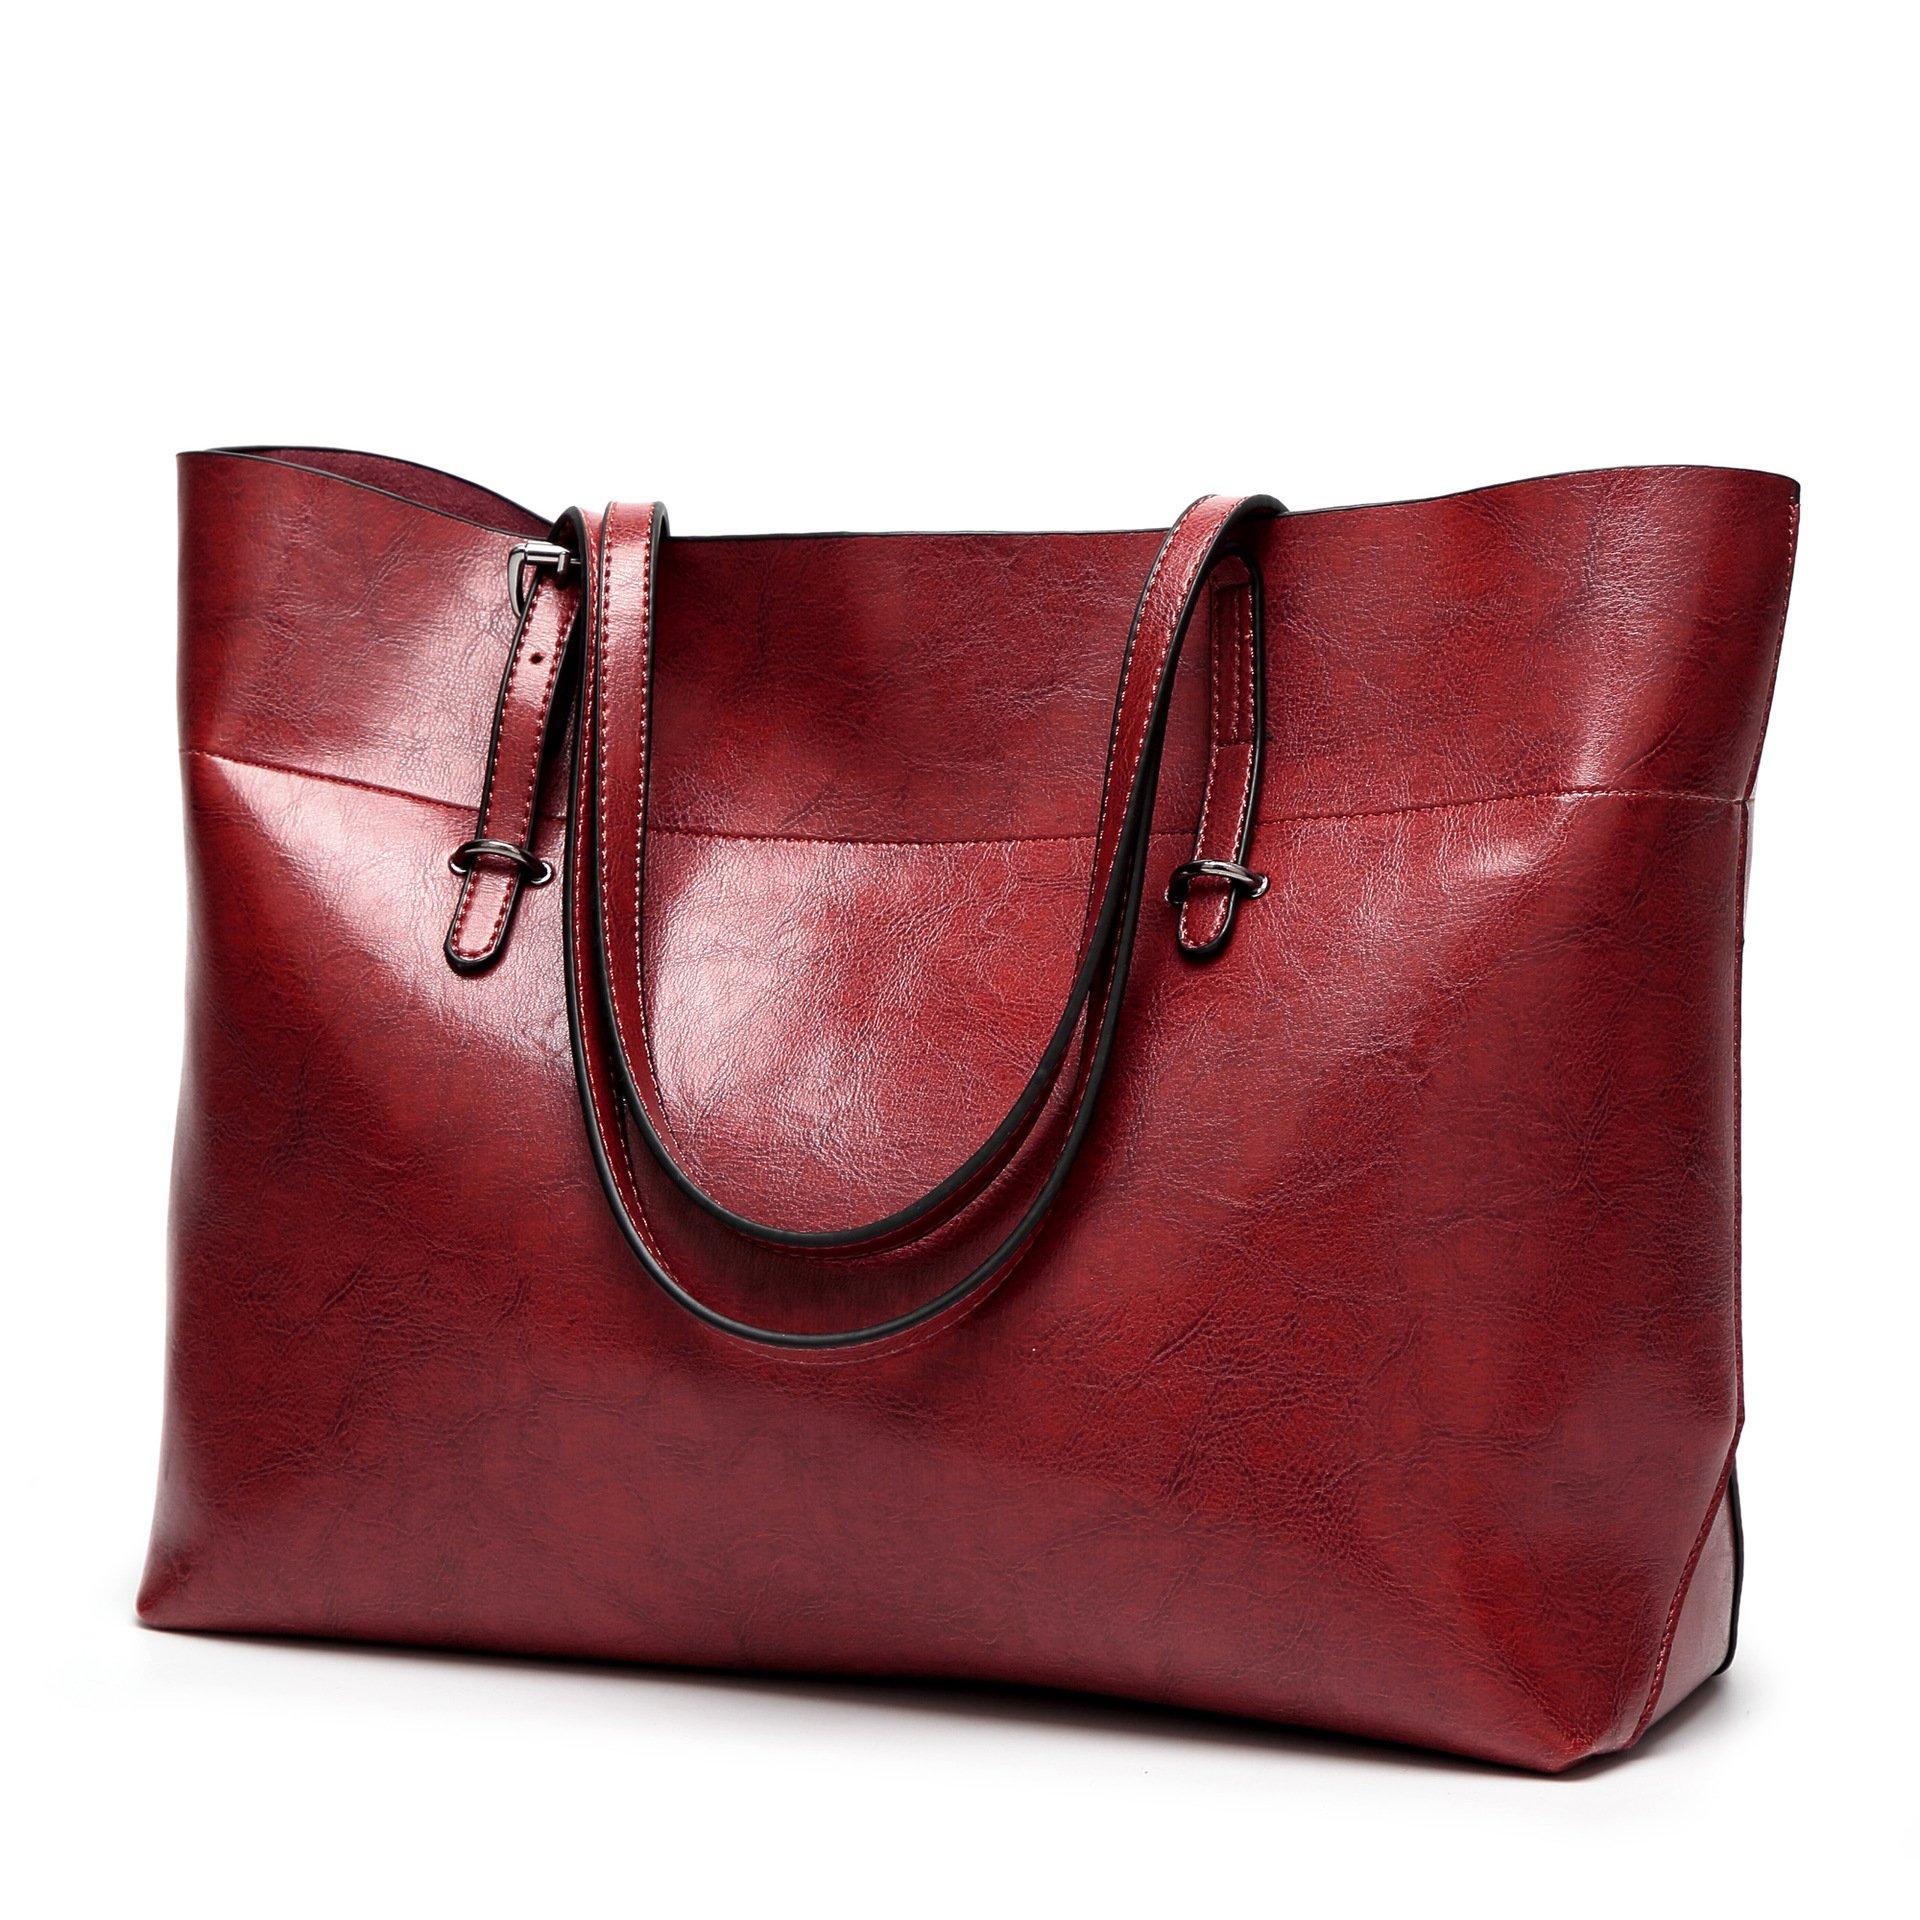 Obosoyo Women Top Handle Satchel Handbags Bag Shoulder Hobo Messenger Bag Tote Purse Wine red